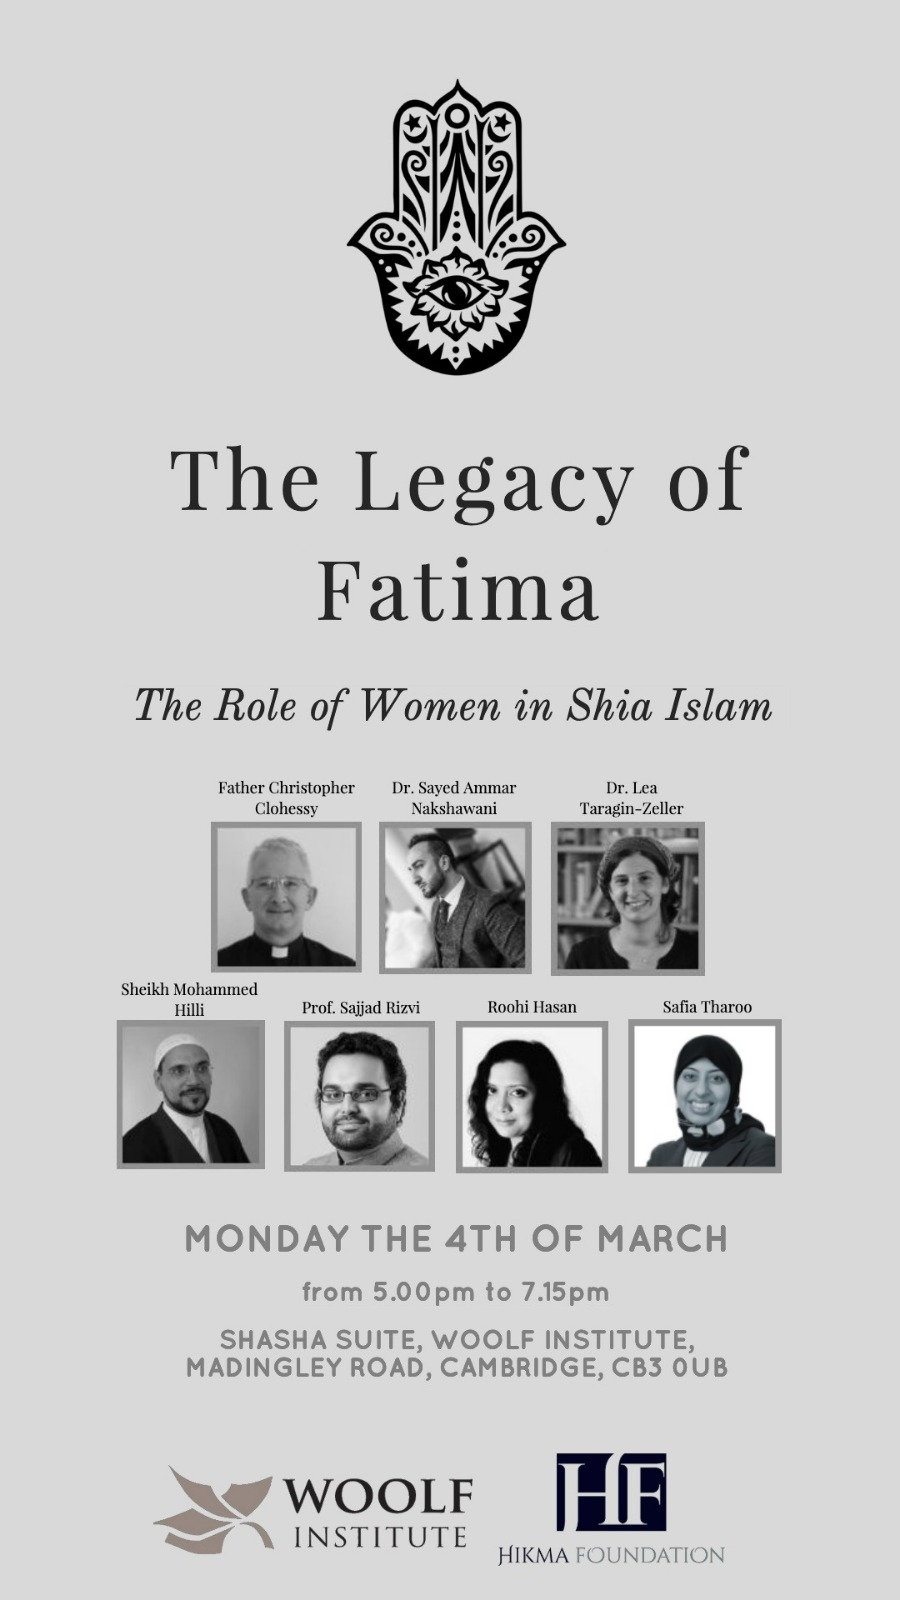 The Role of Women in Shia Islam